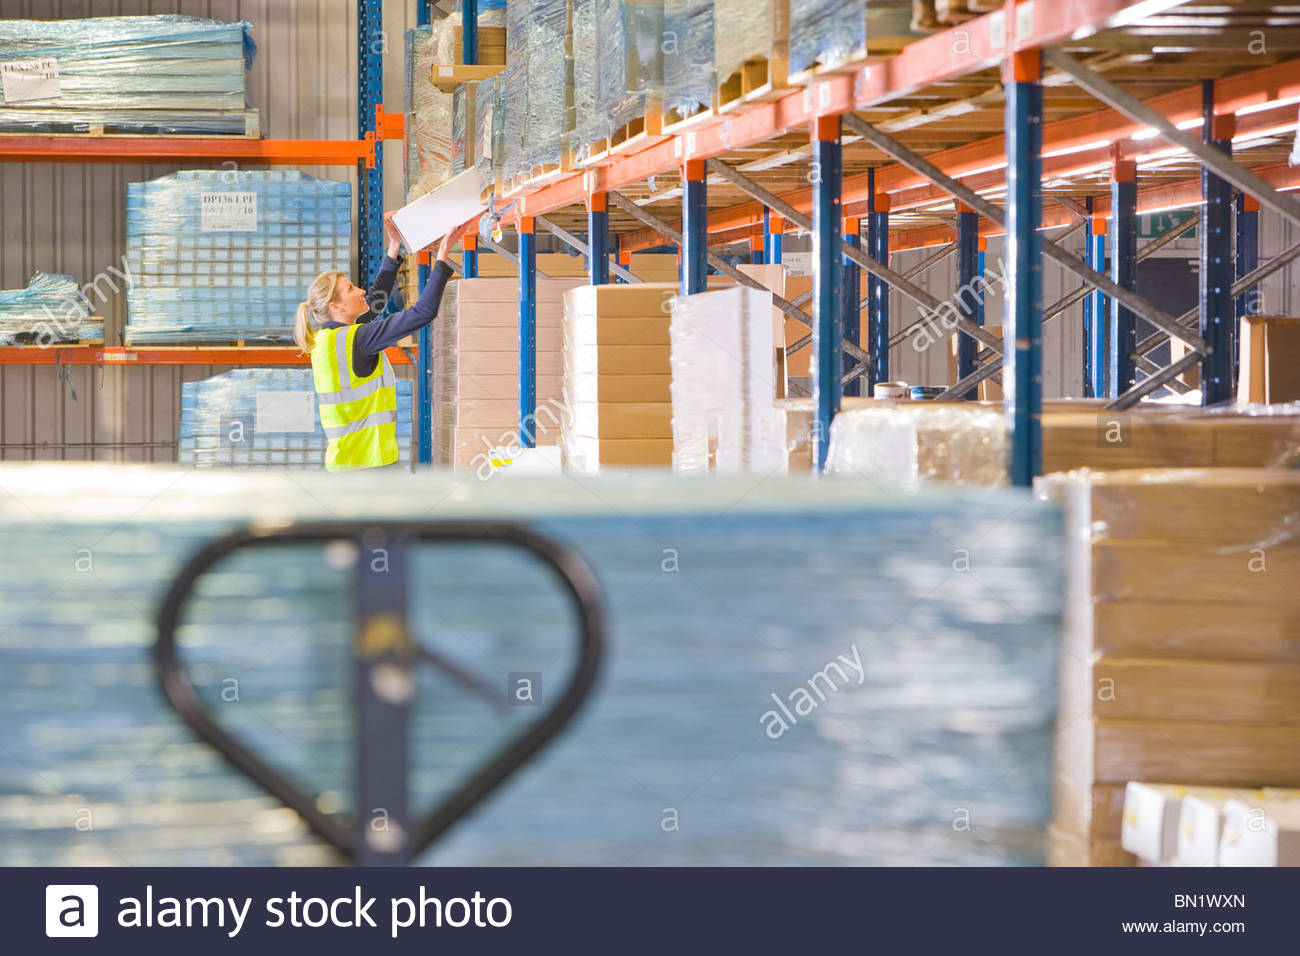 Female warehouse worker lifting box from shelf - Stock Image